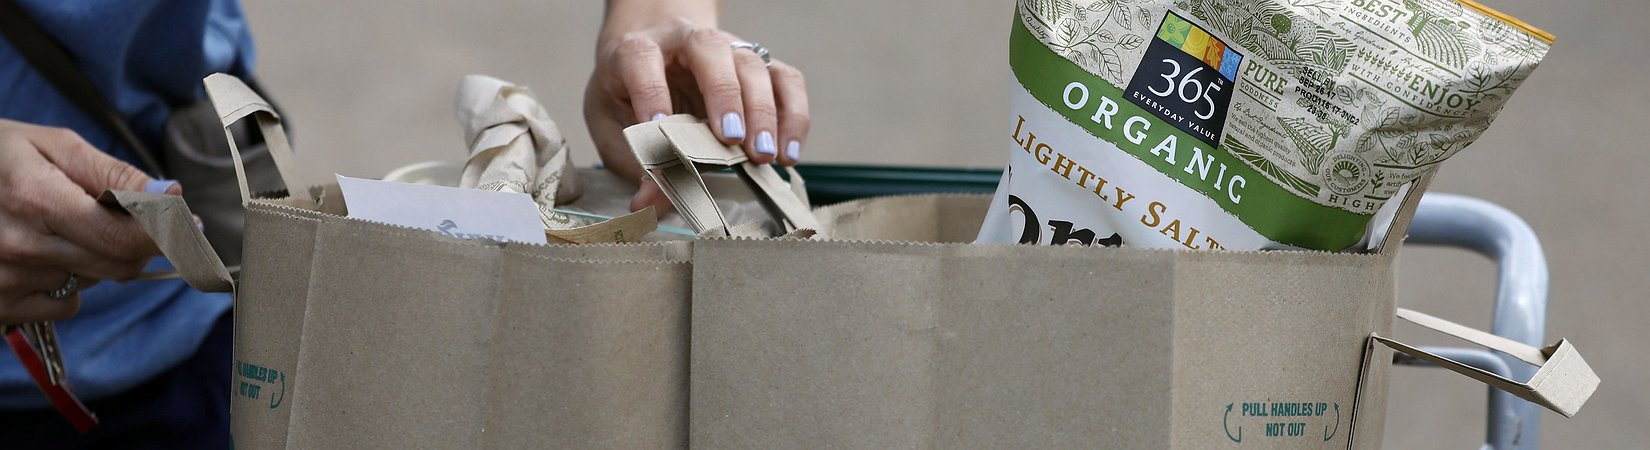 Amazon купила Whole Foods. Кто выиграл и кто проиграл?